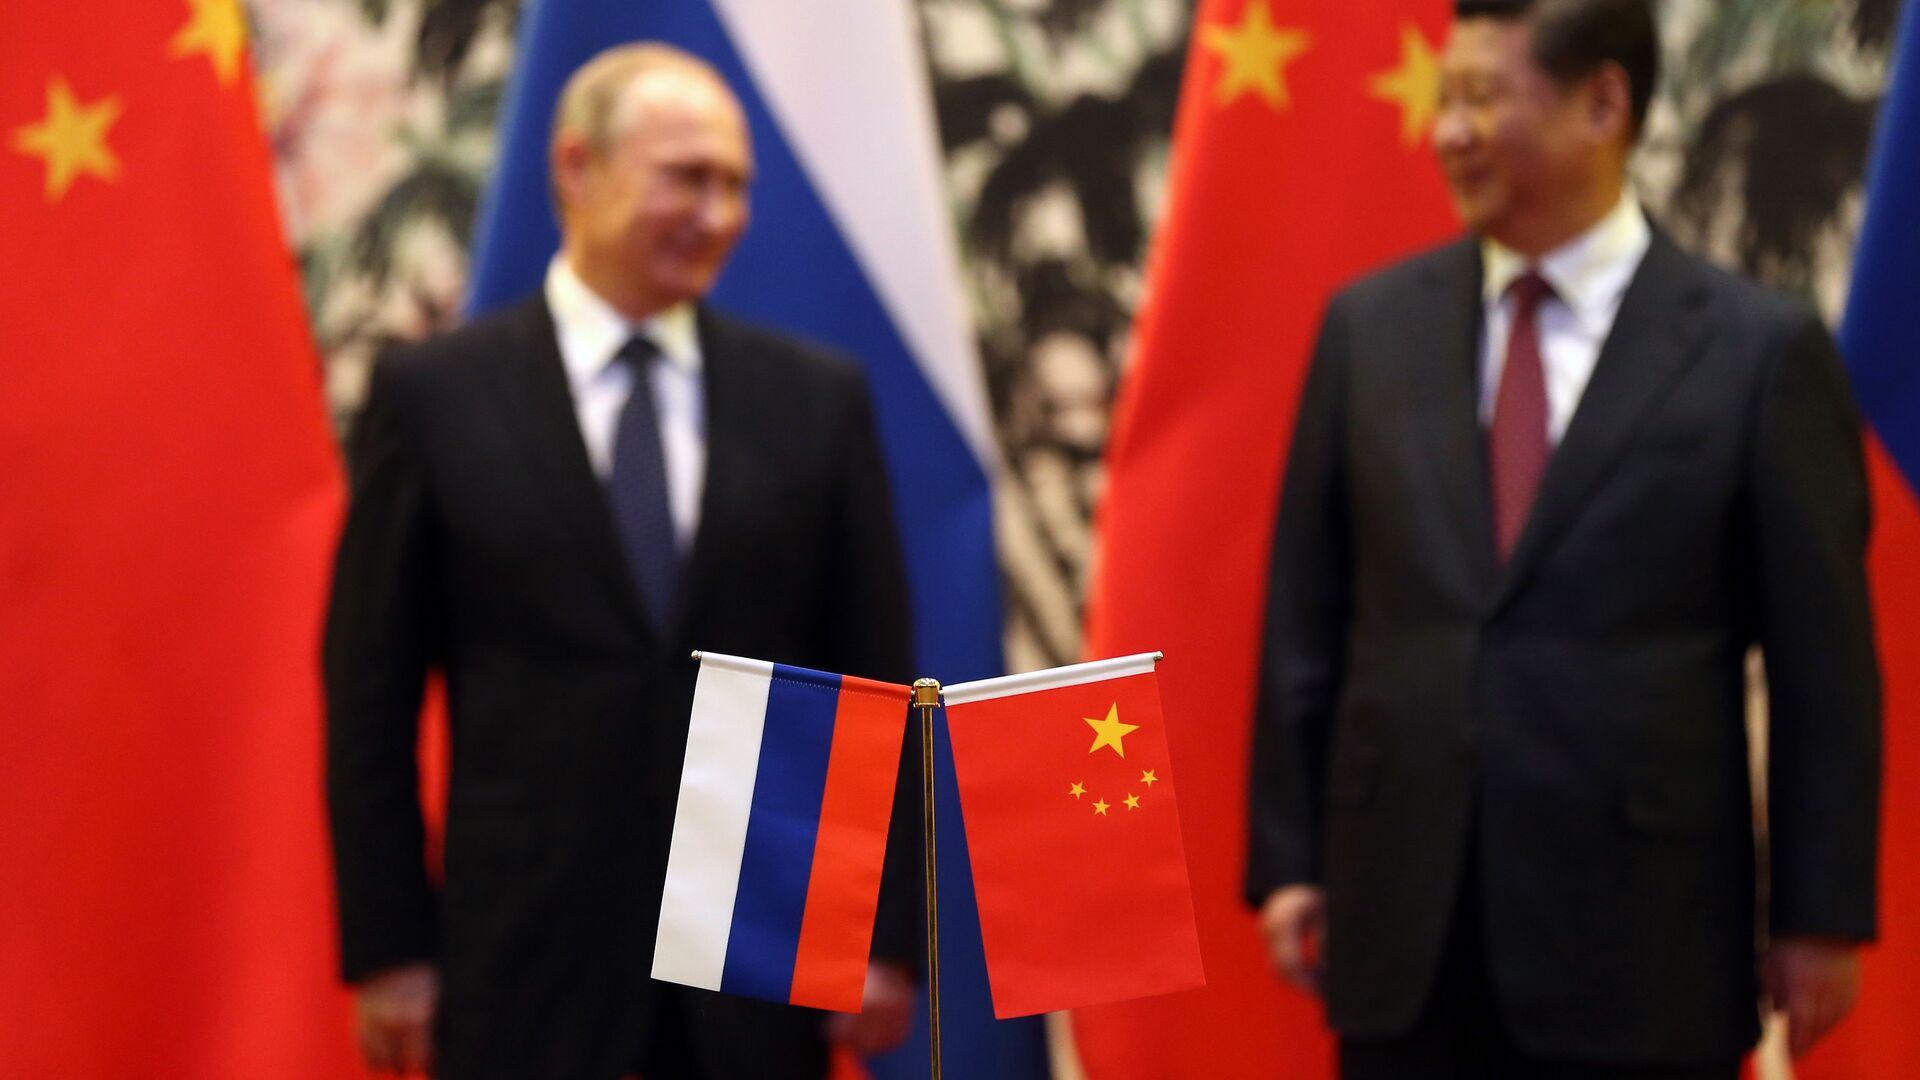 El presidente de Rusia, Vladímir Putin, con su homólogo chino (archivo) - Sputnik Mundo, 1920, 14.06.2021